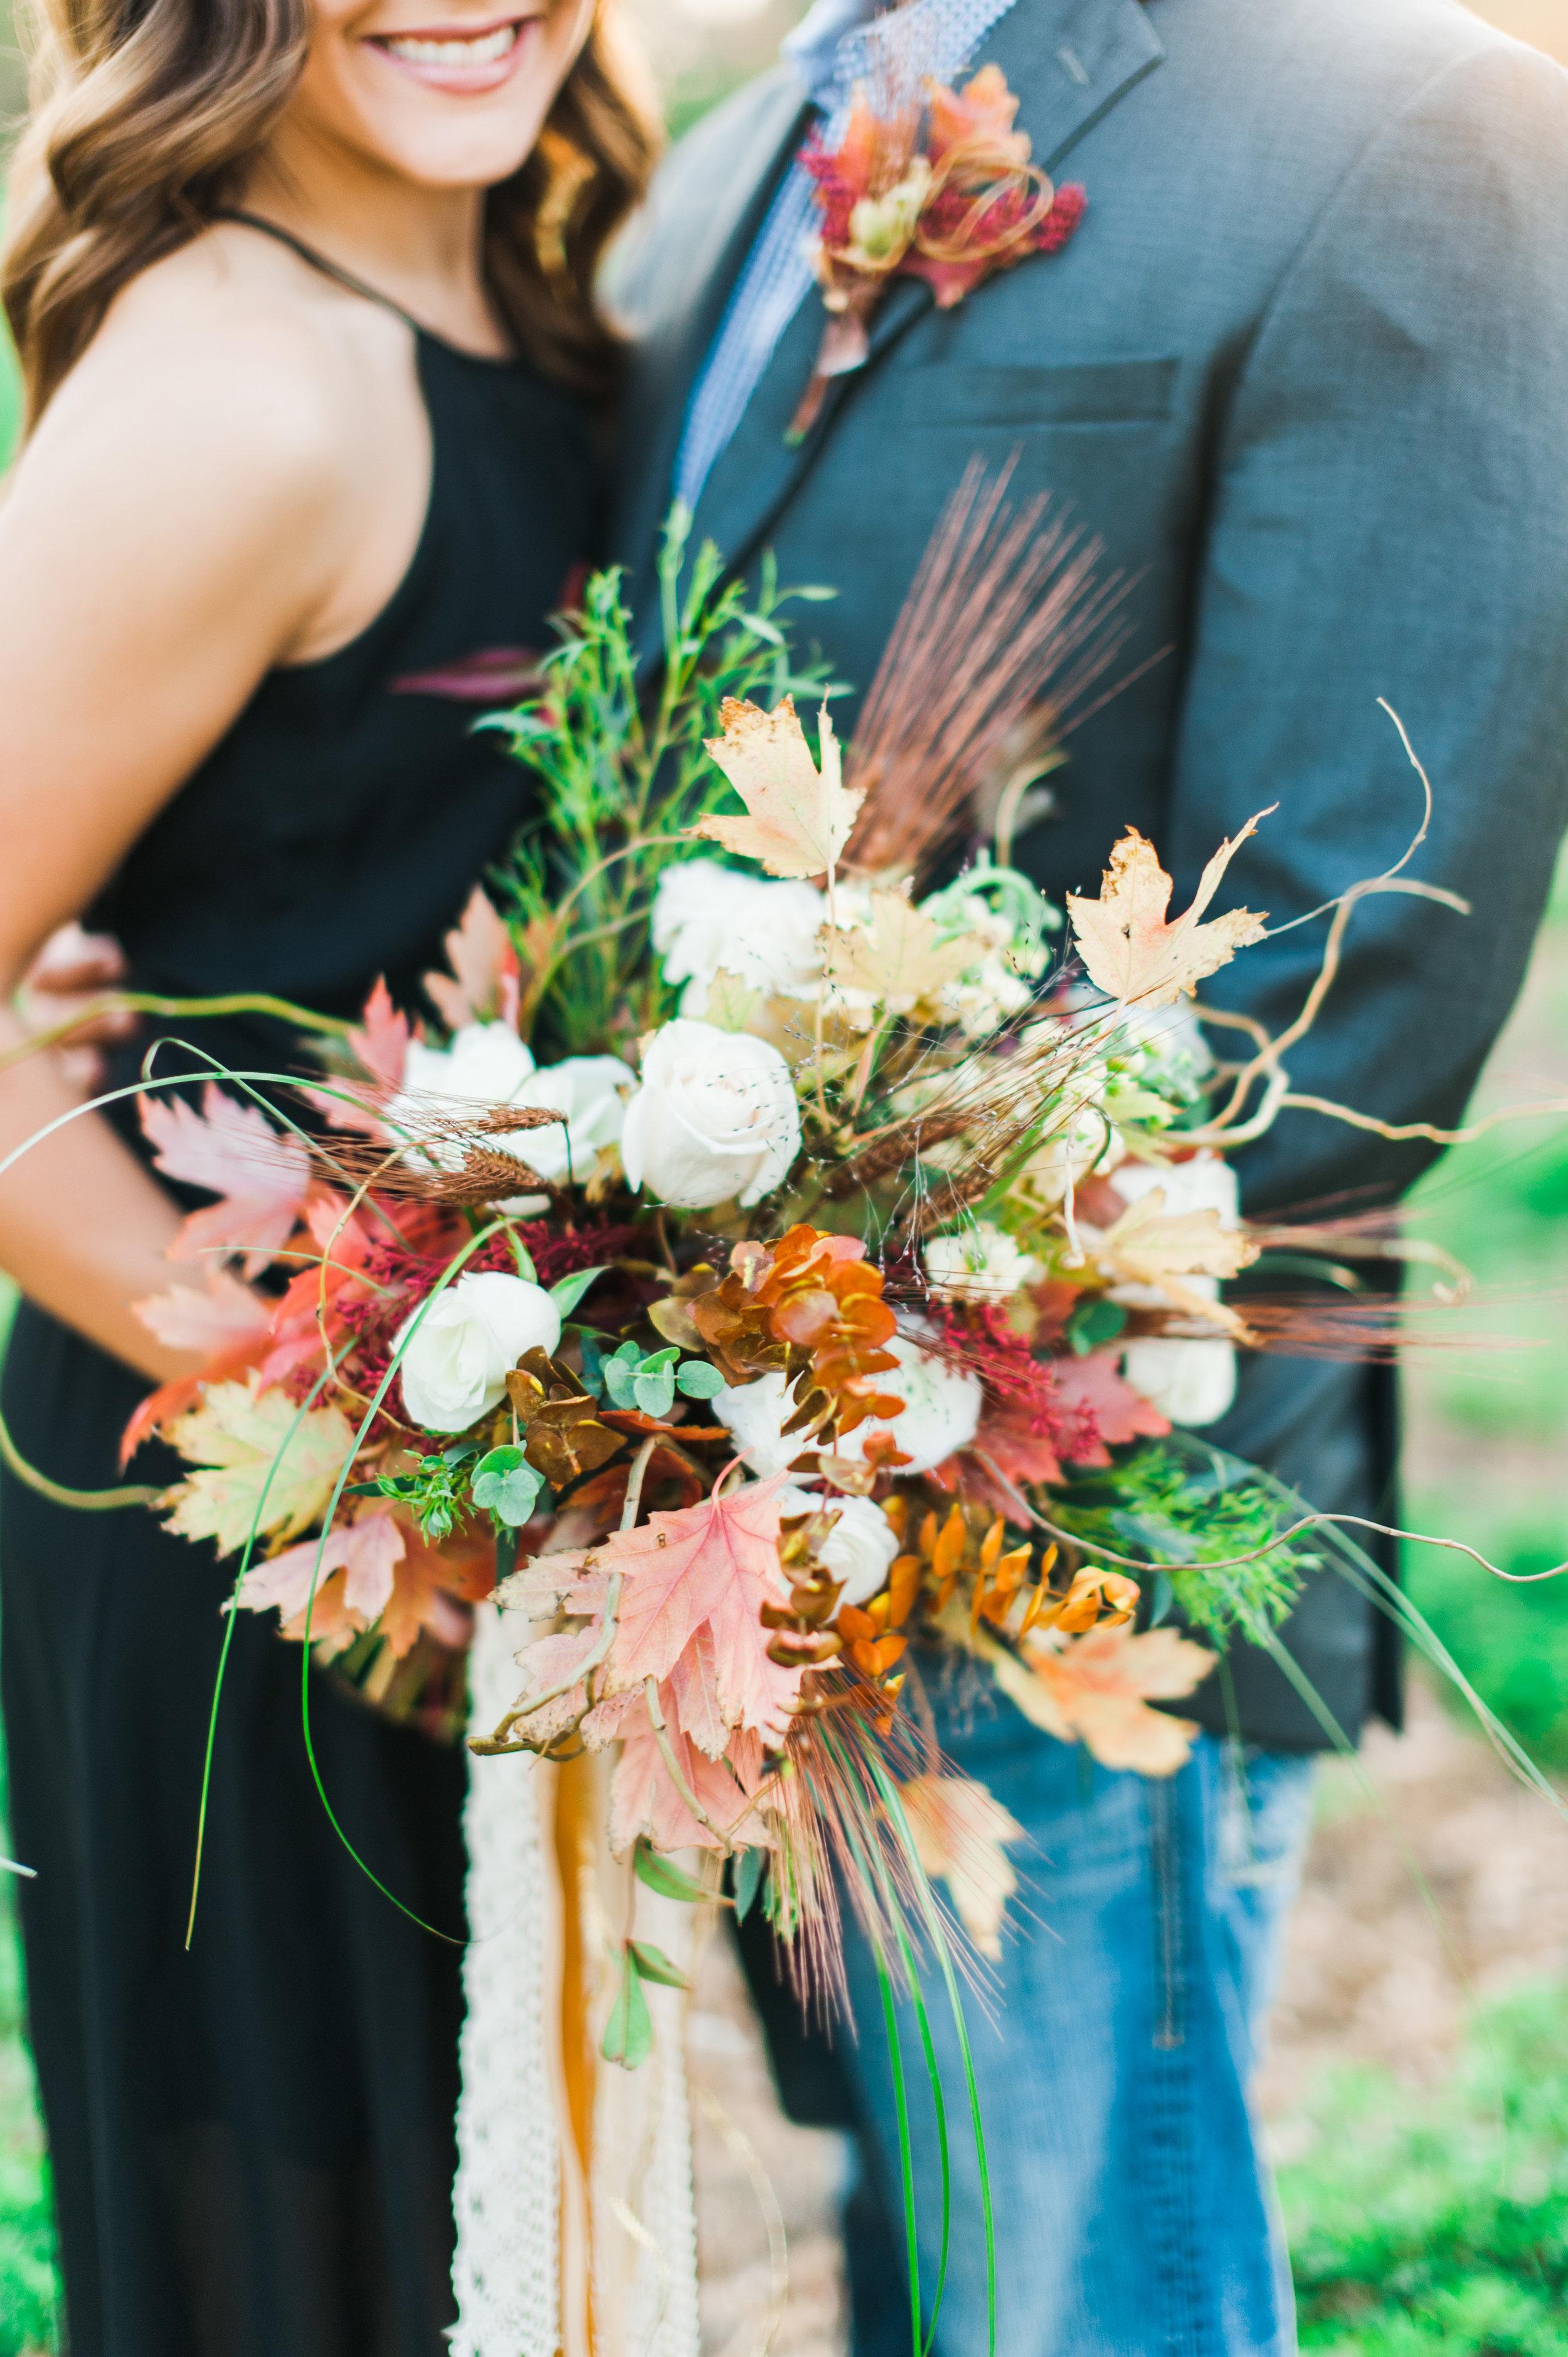 Kearney florist Diva's Floral Shop & Boutique. Photography by Kearney wedding photographer www.samanthaweddings.com